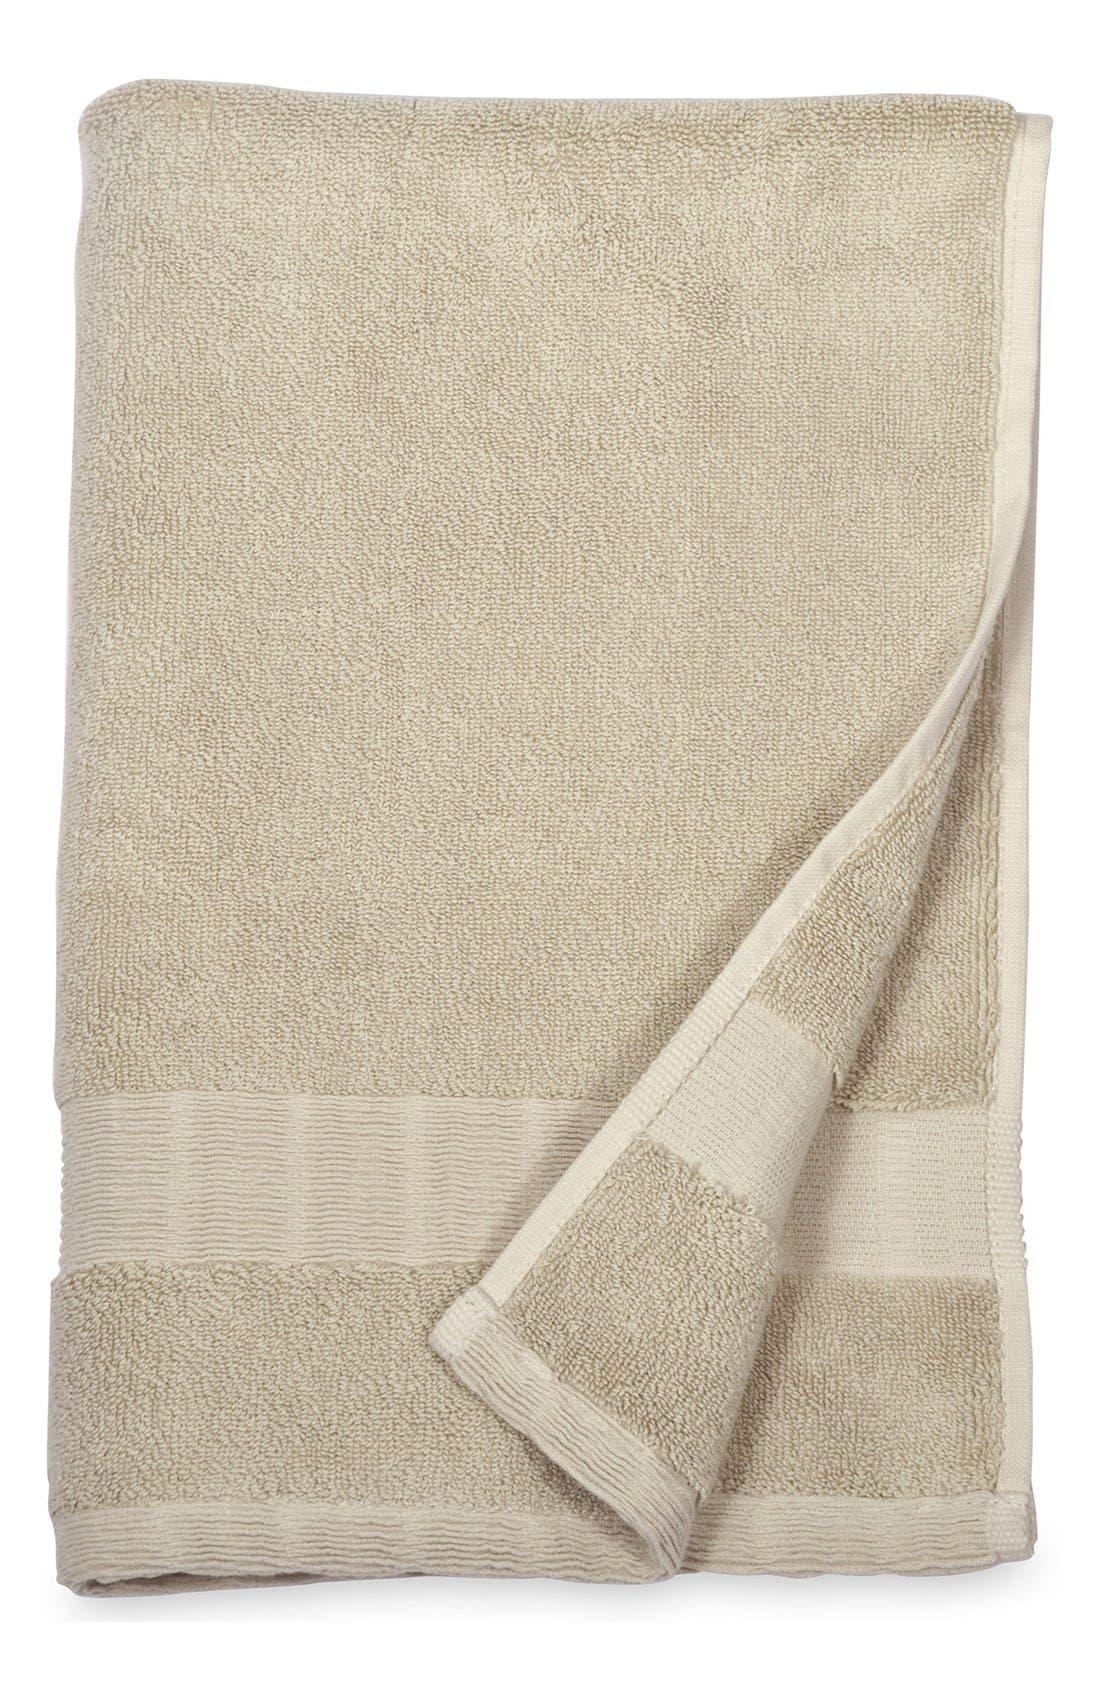 Alternate Image 1 Selected - DKNY Mercer Hand Towel